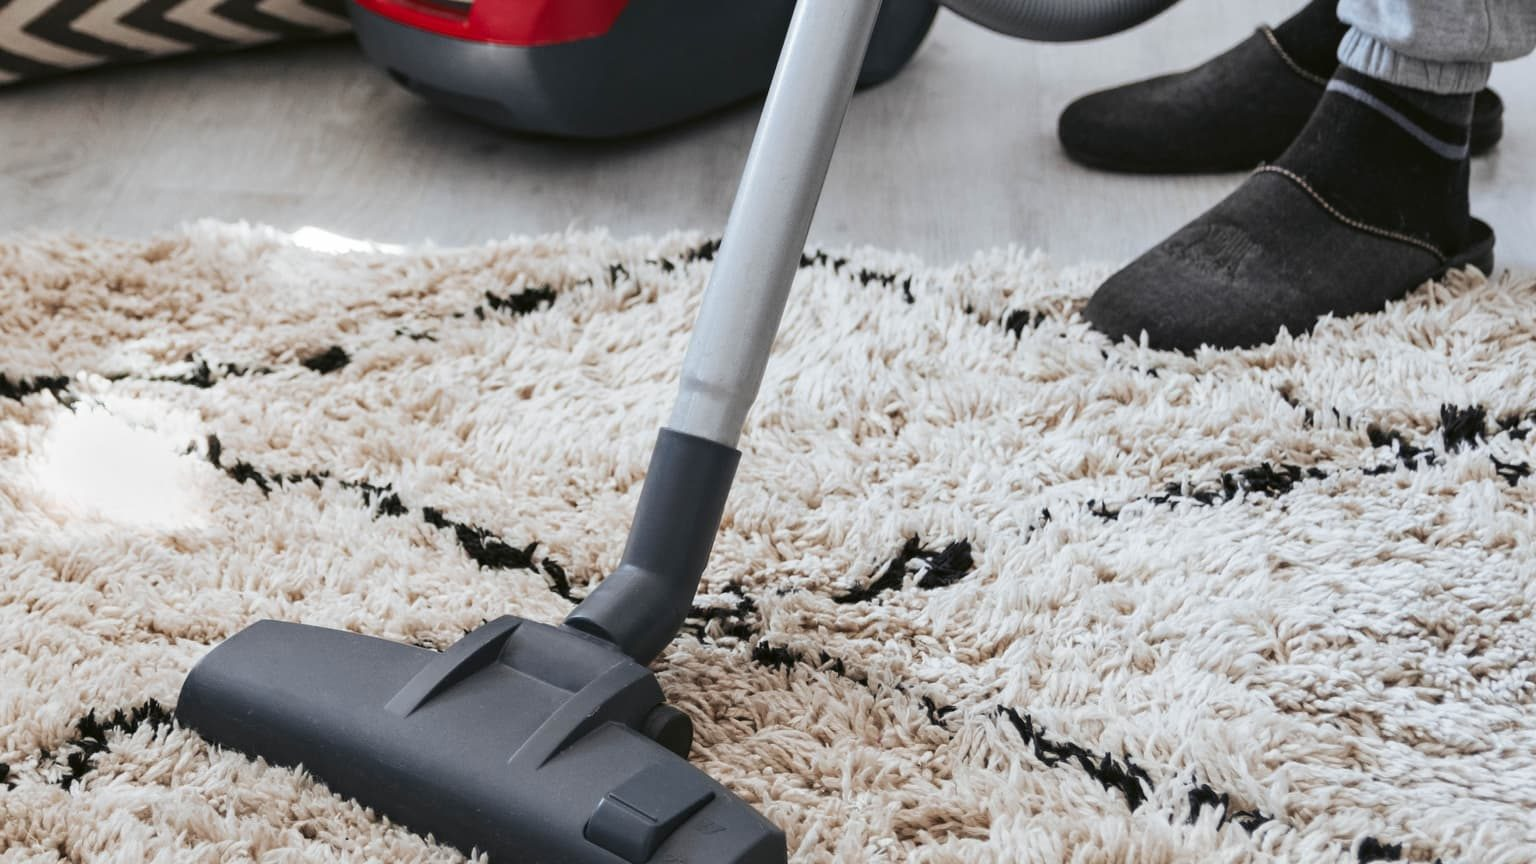 man cleaning carpet using a vaccum